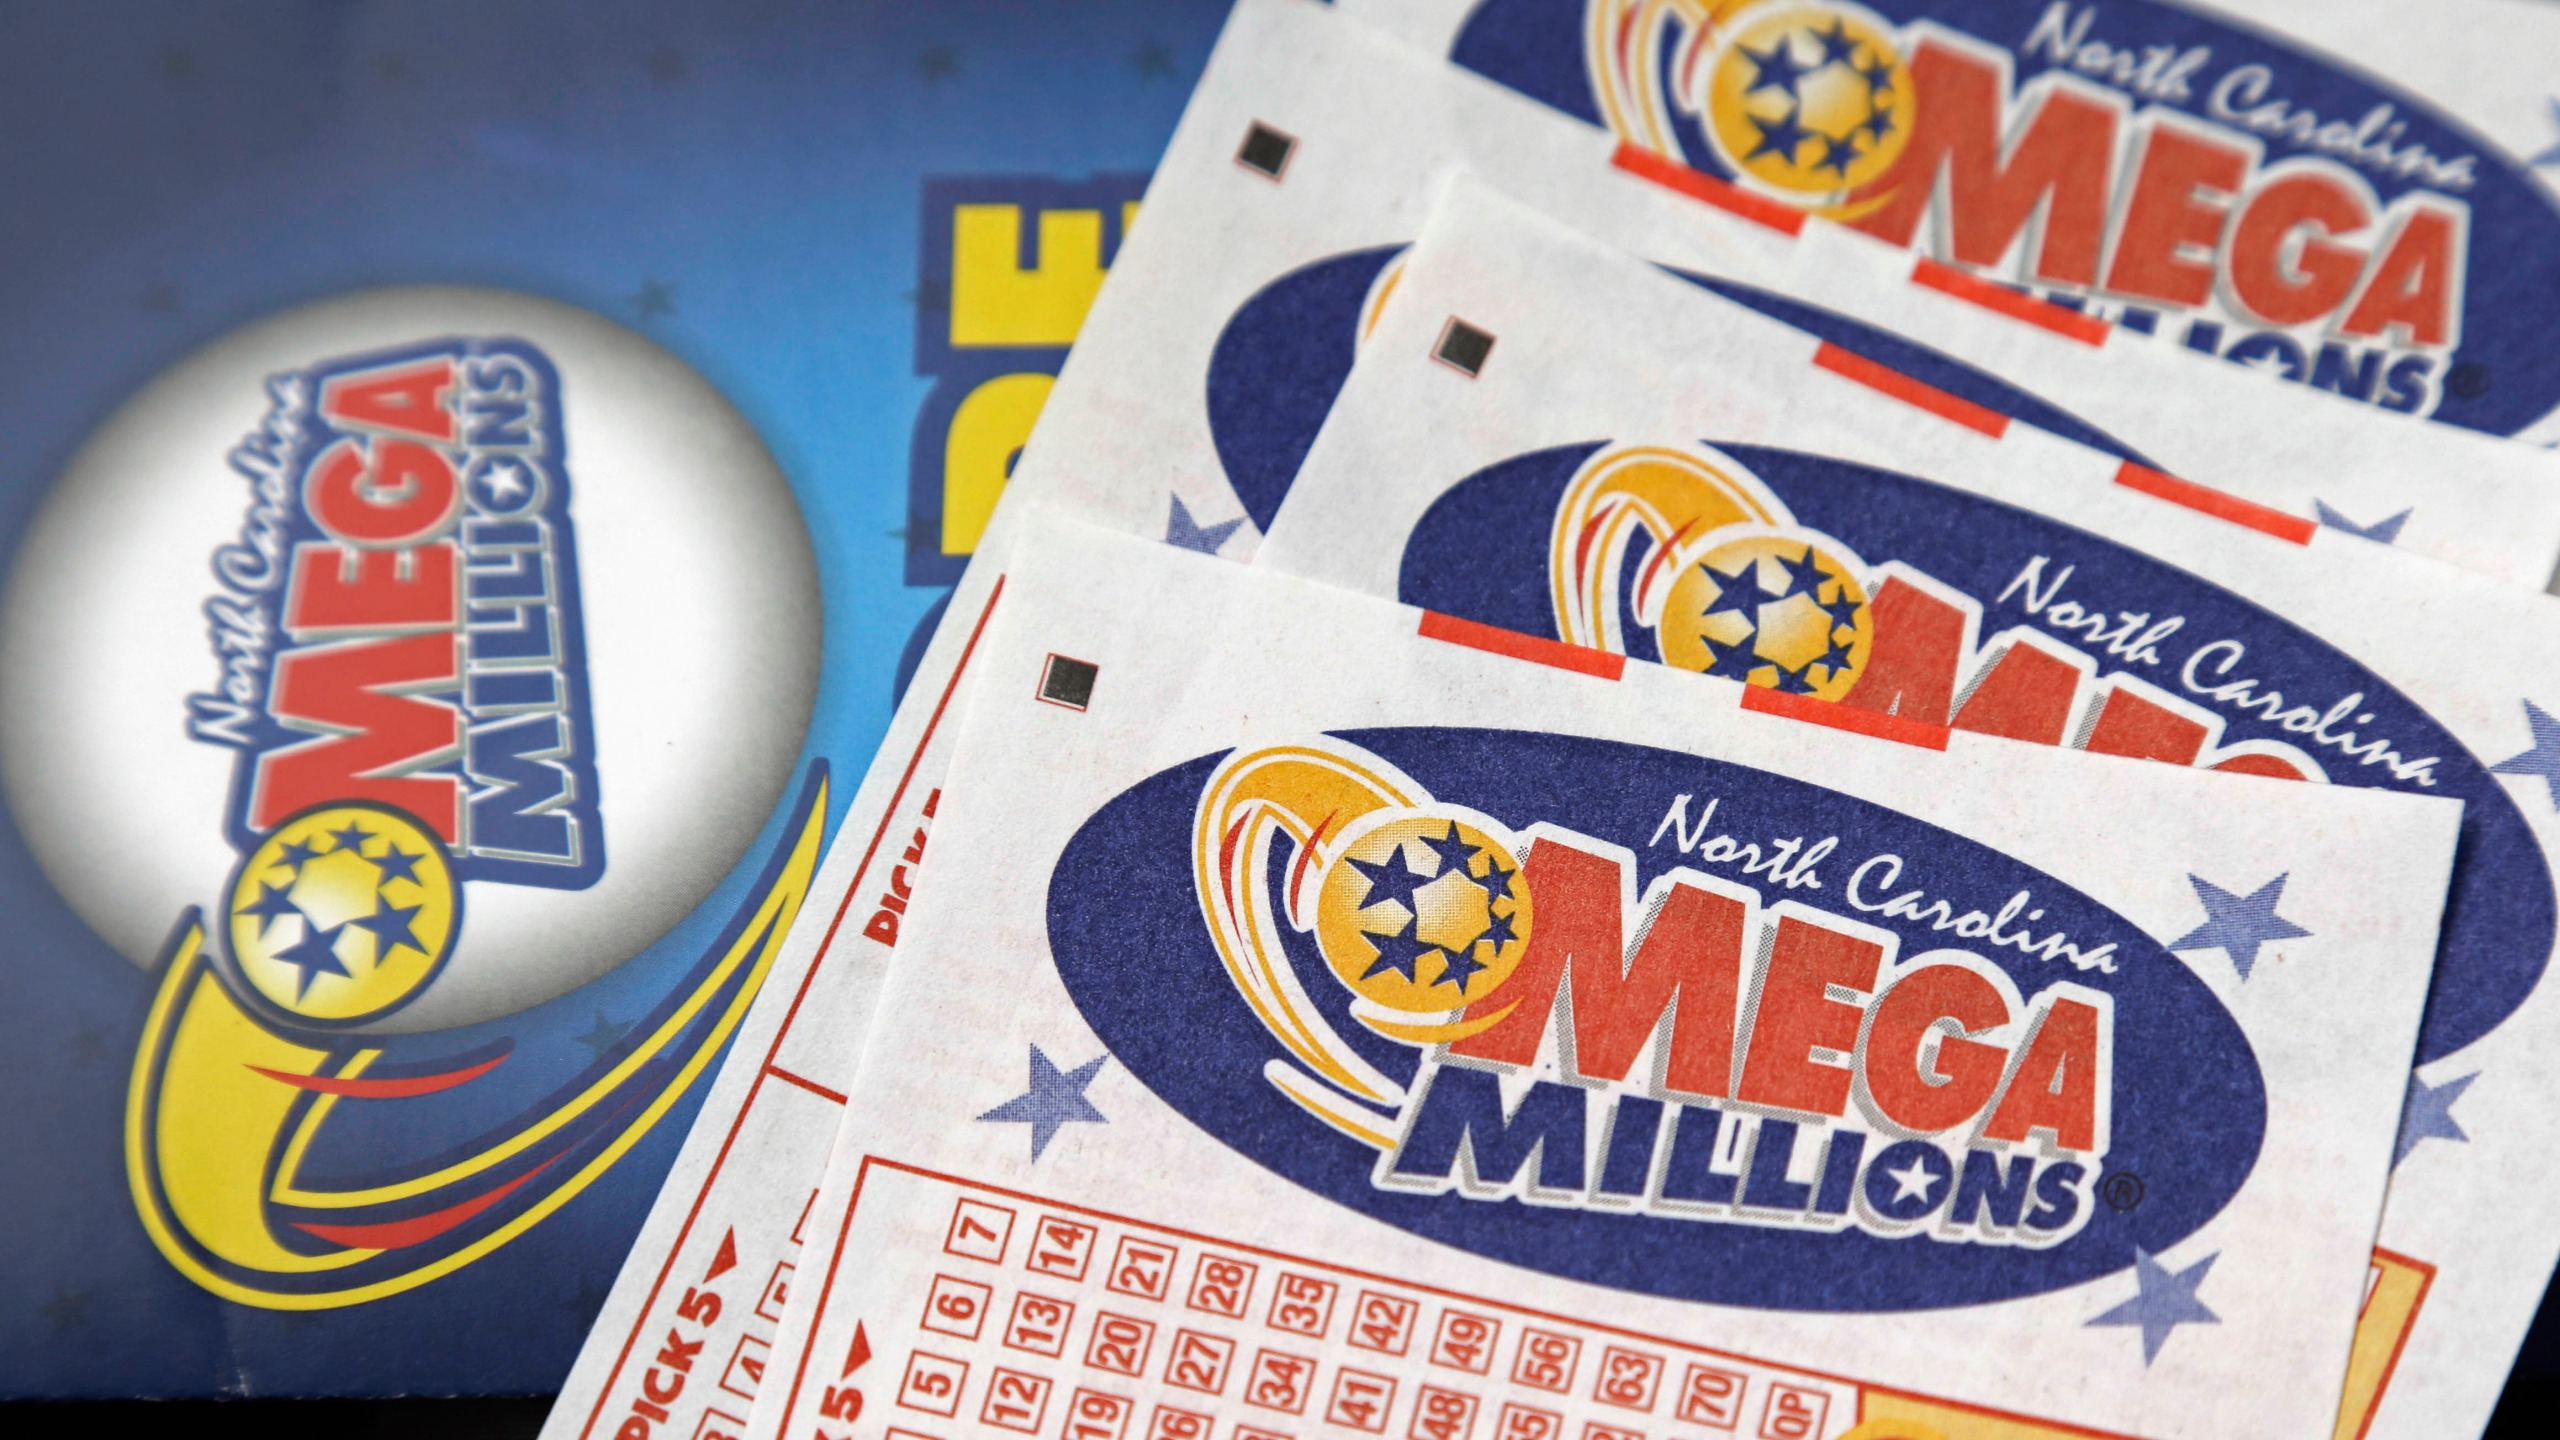 Tuesday's winning Mega Millions numbers drawn